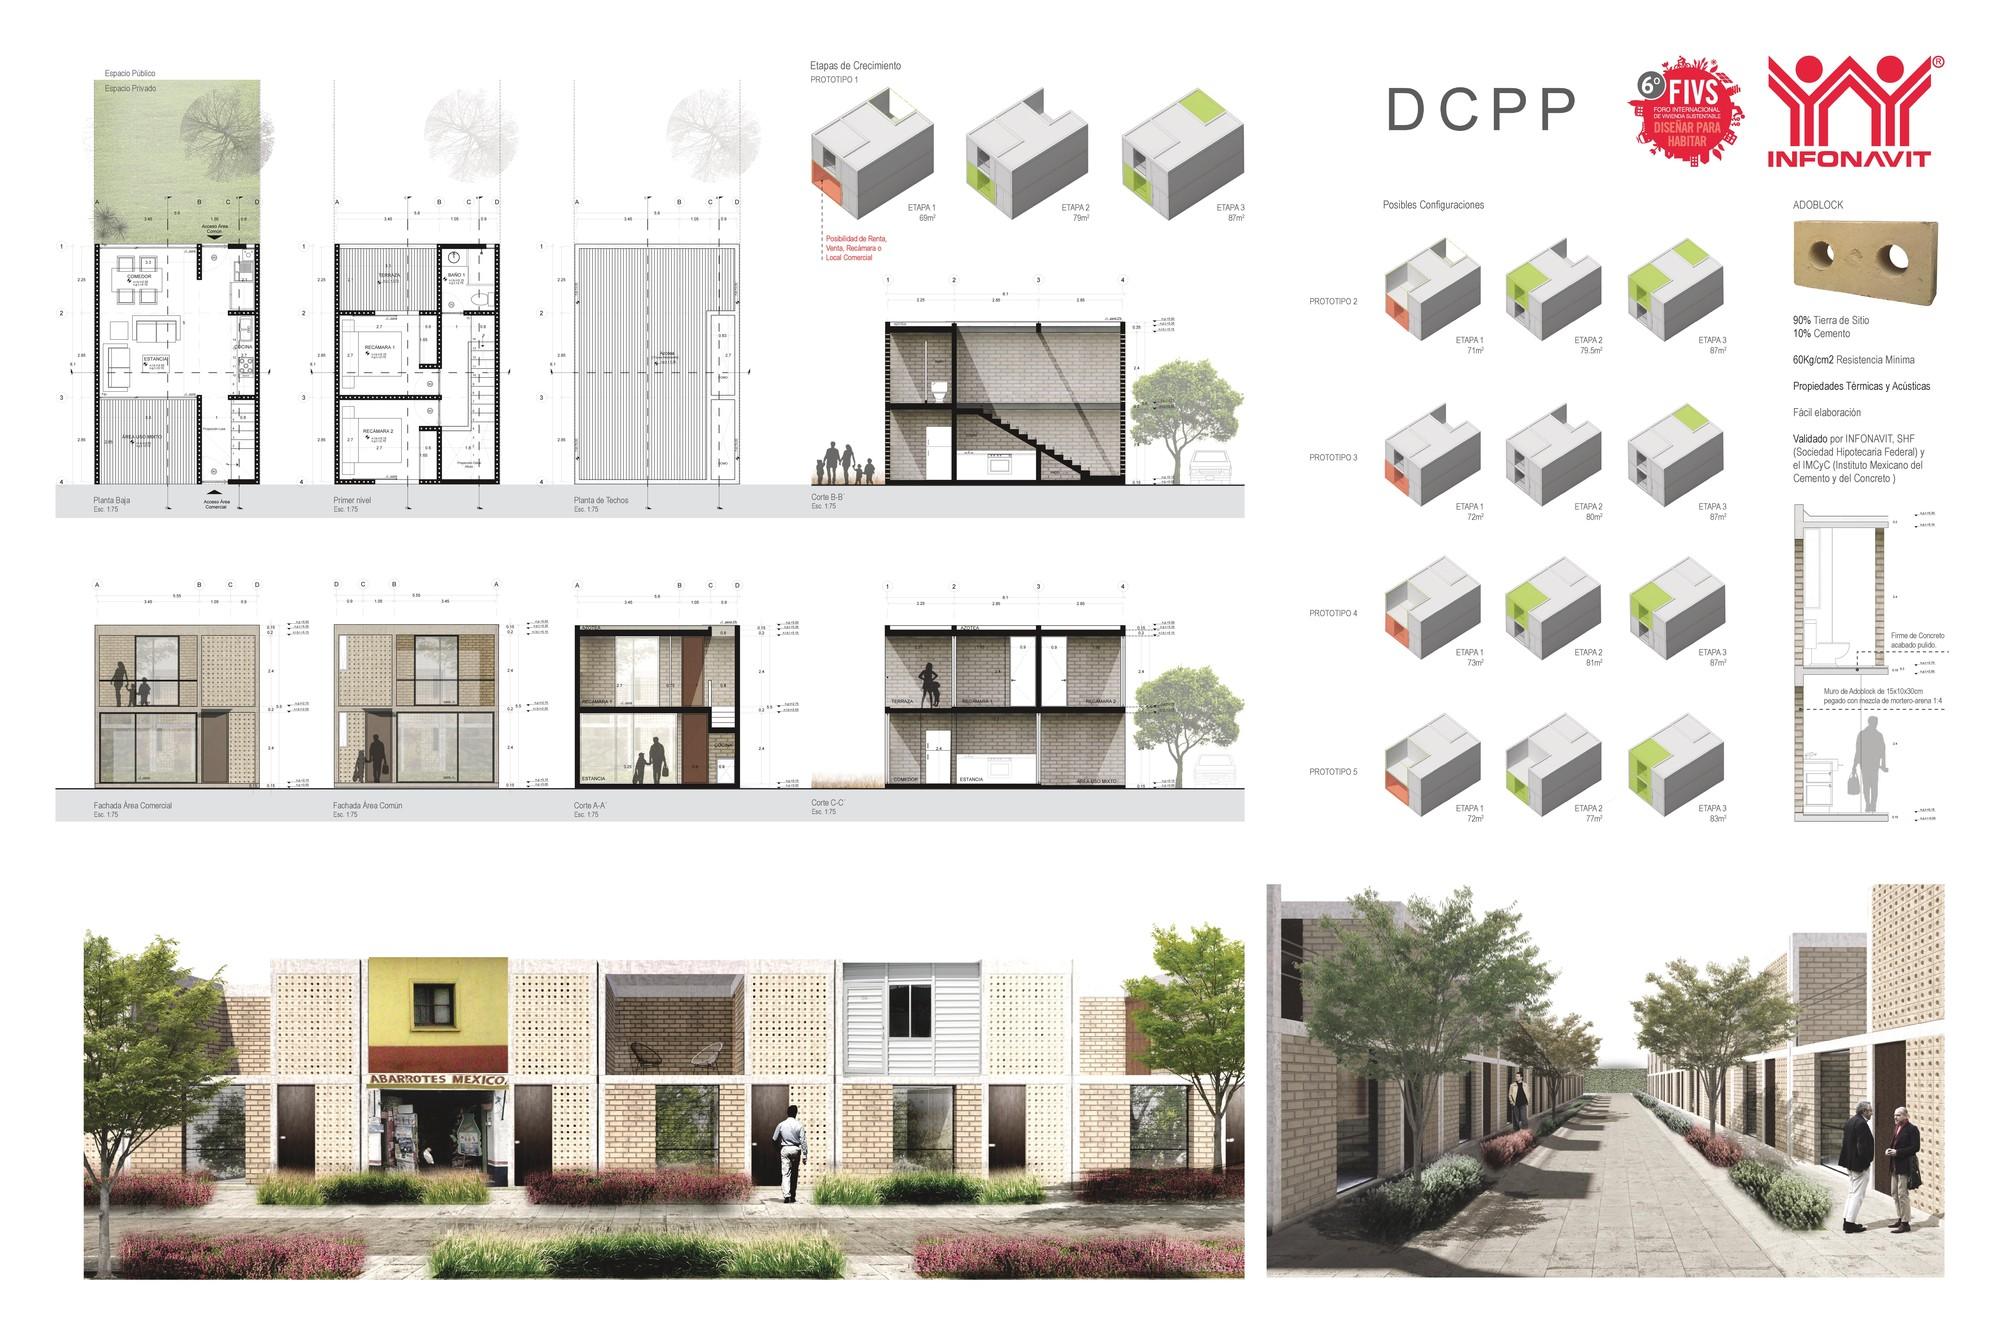 Galer a de vivienda unifamiliar regional 32 entidades for Antropometria de la vivienda pdf